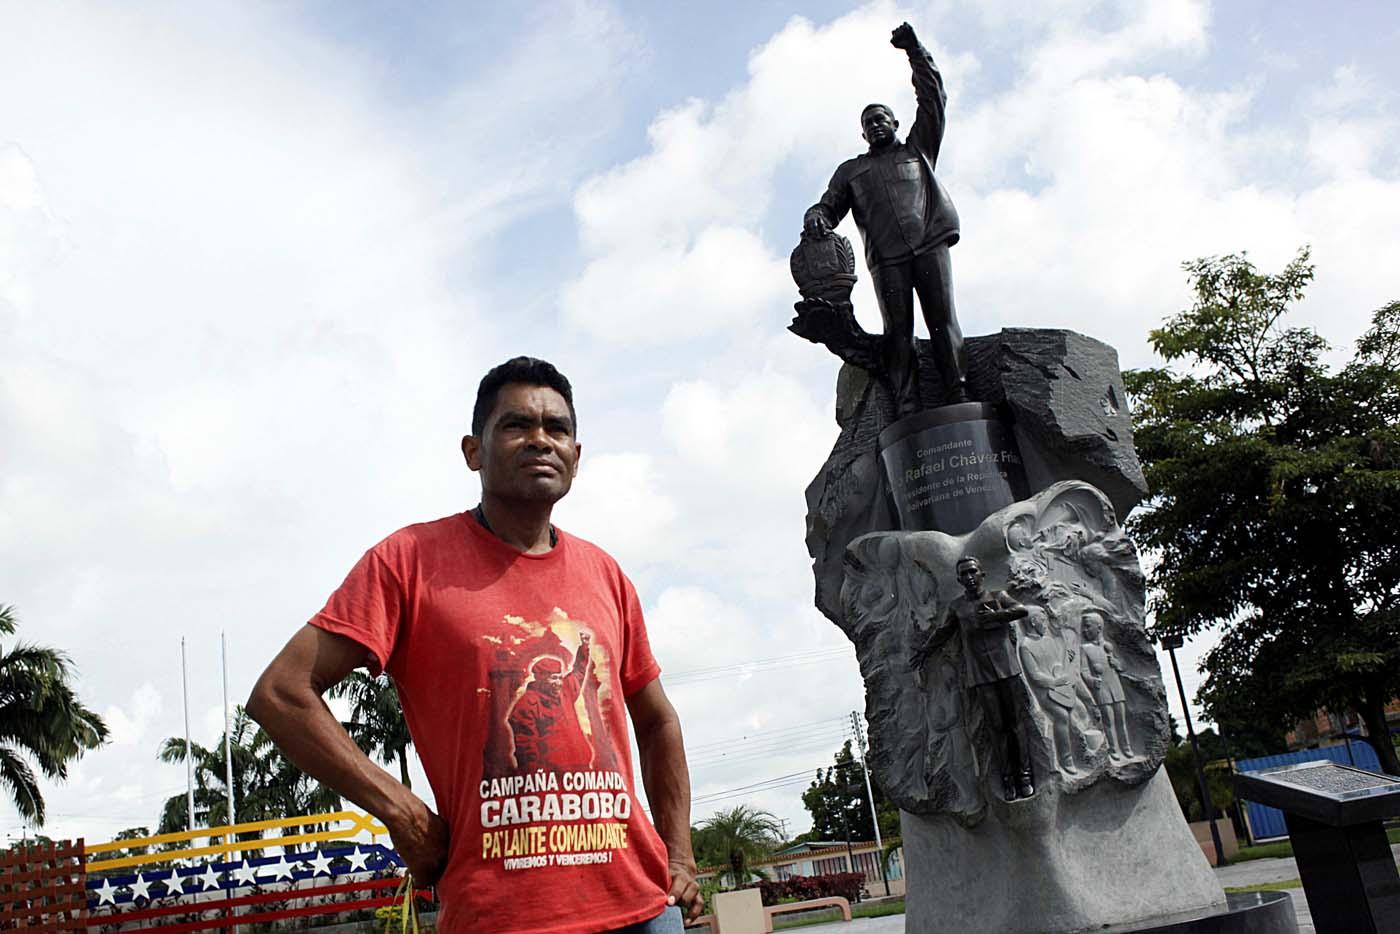 Denny Frias poses for a picture in front of a statue of Venezuela's late President Hugo Chavez in Sabaneta, Venezuela June 13, 2017. Picture taken June 13, 2017. REUTERS/Carlos Eduardo Ramirez